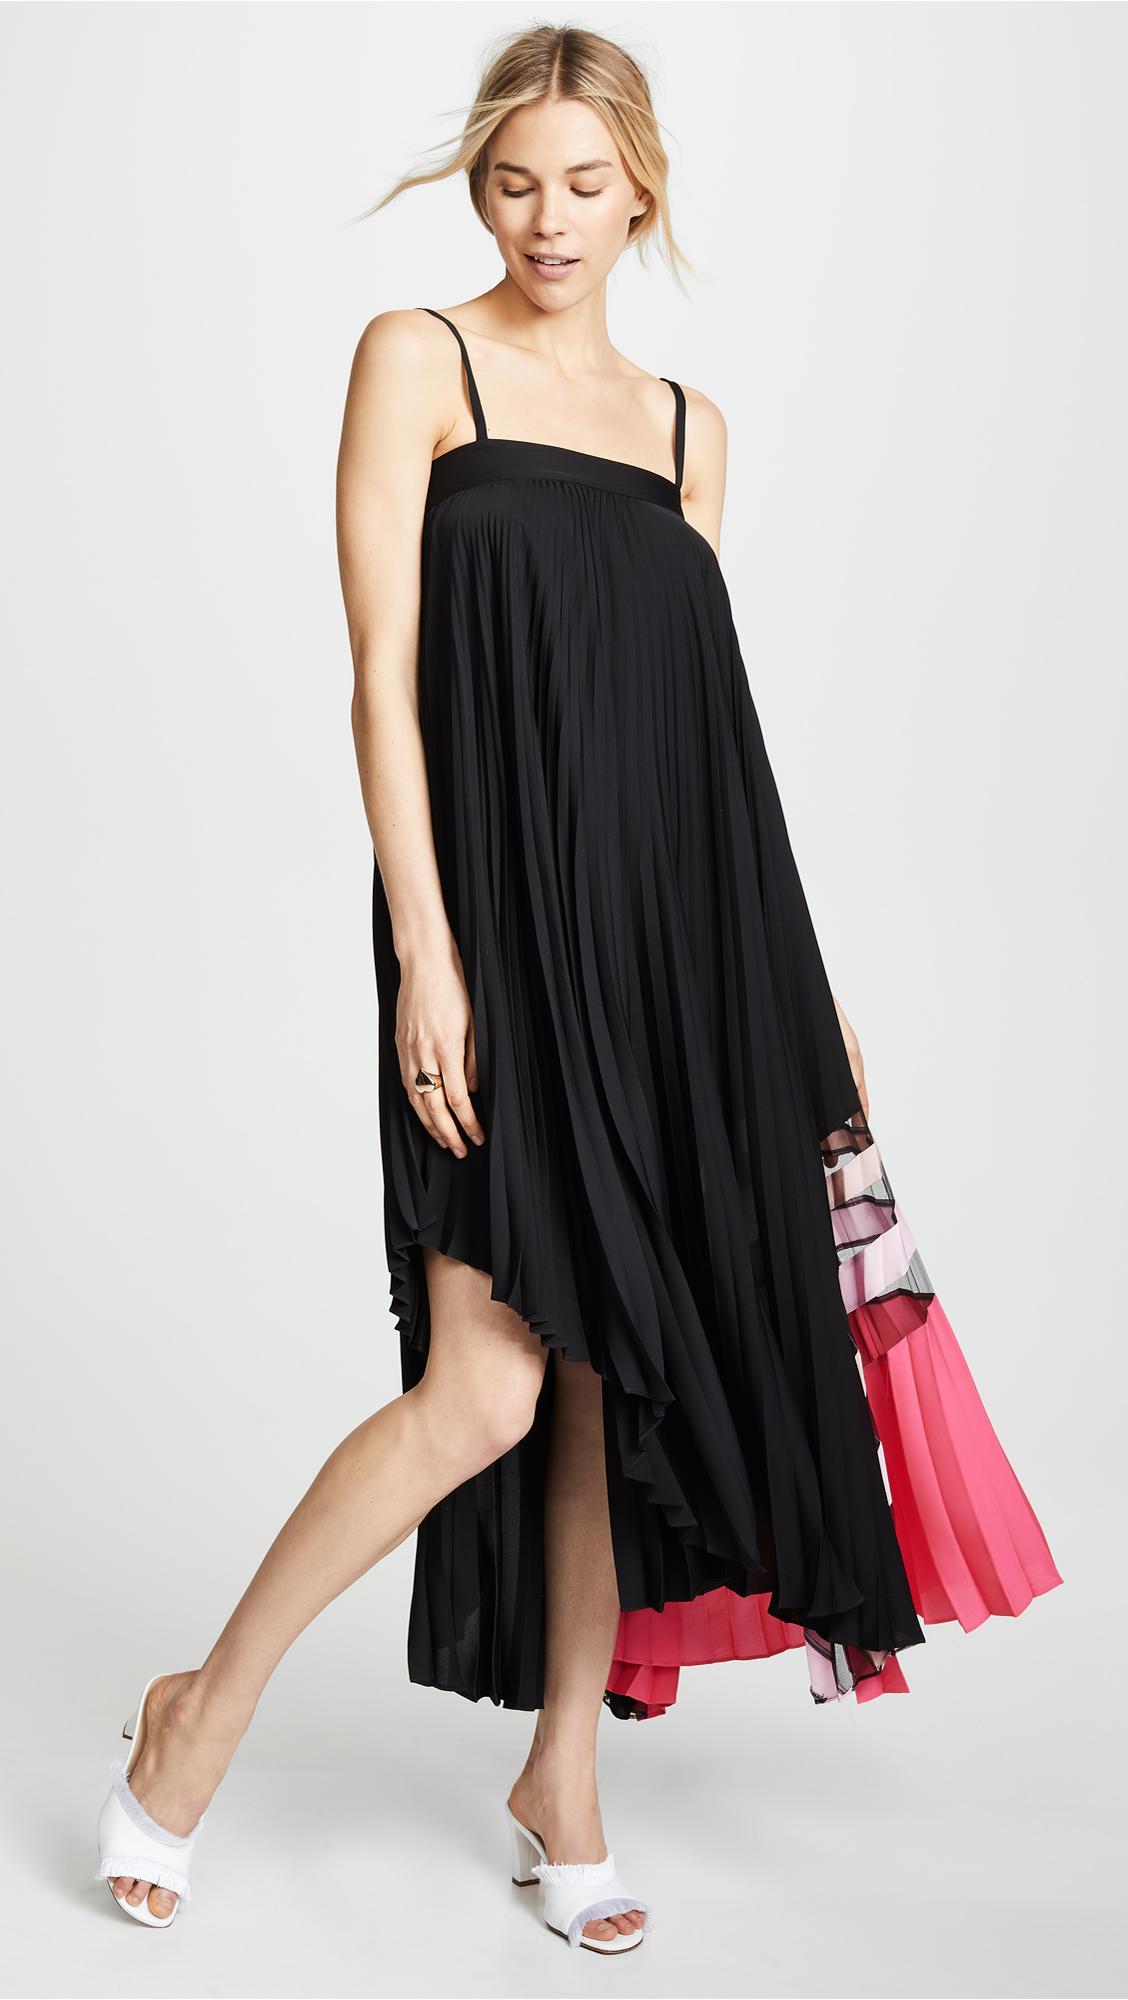 7699c7786ed7 Lyst - MILLY Irene Dress in Black